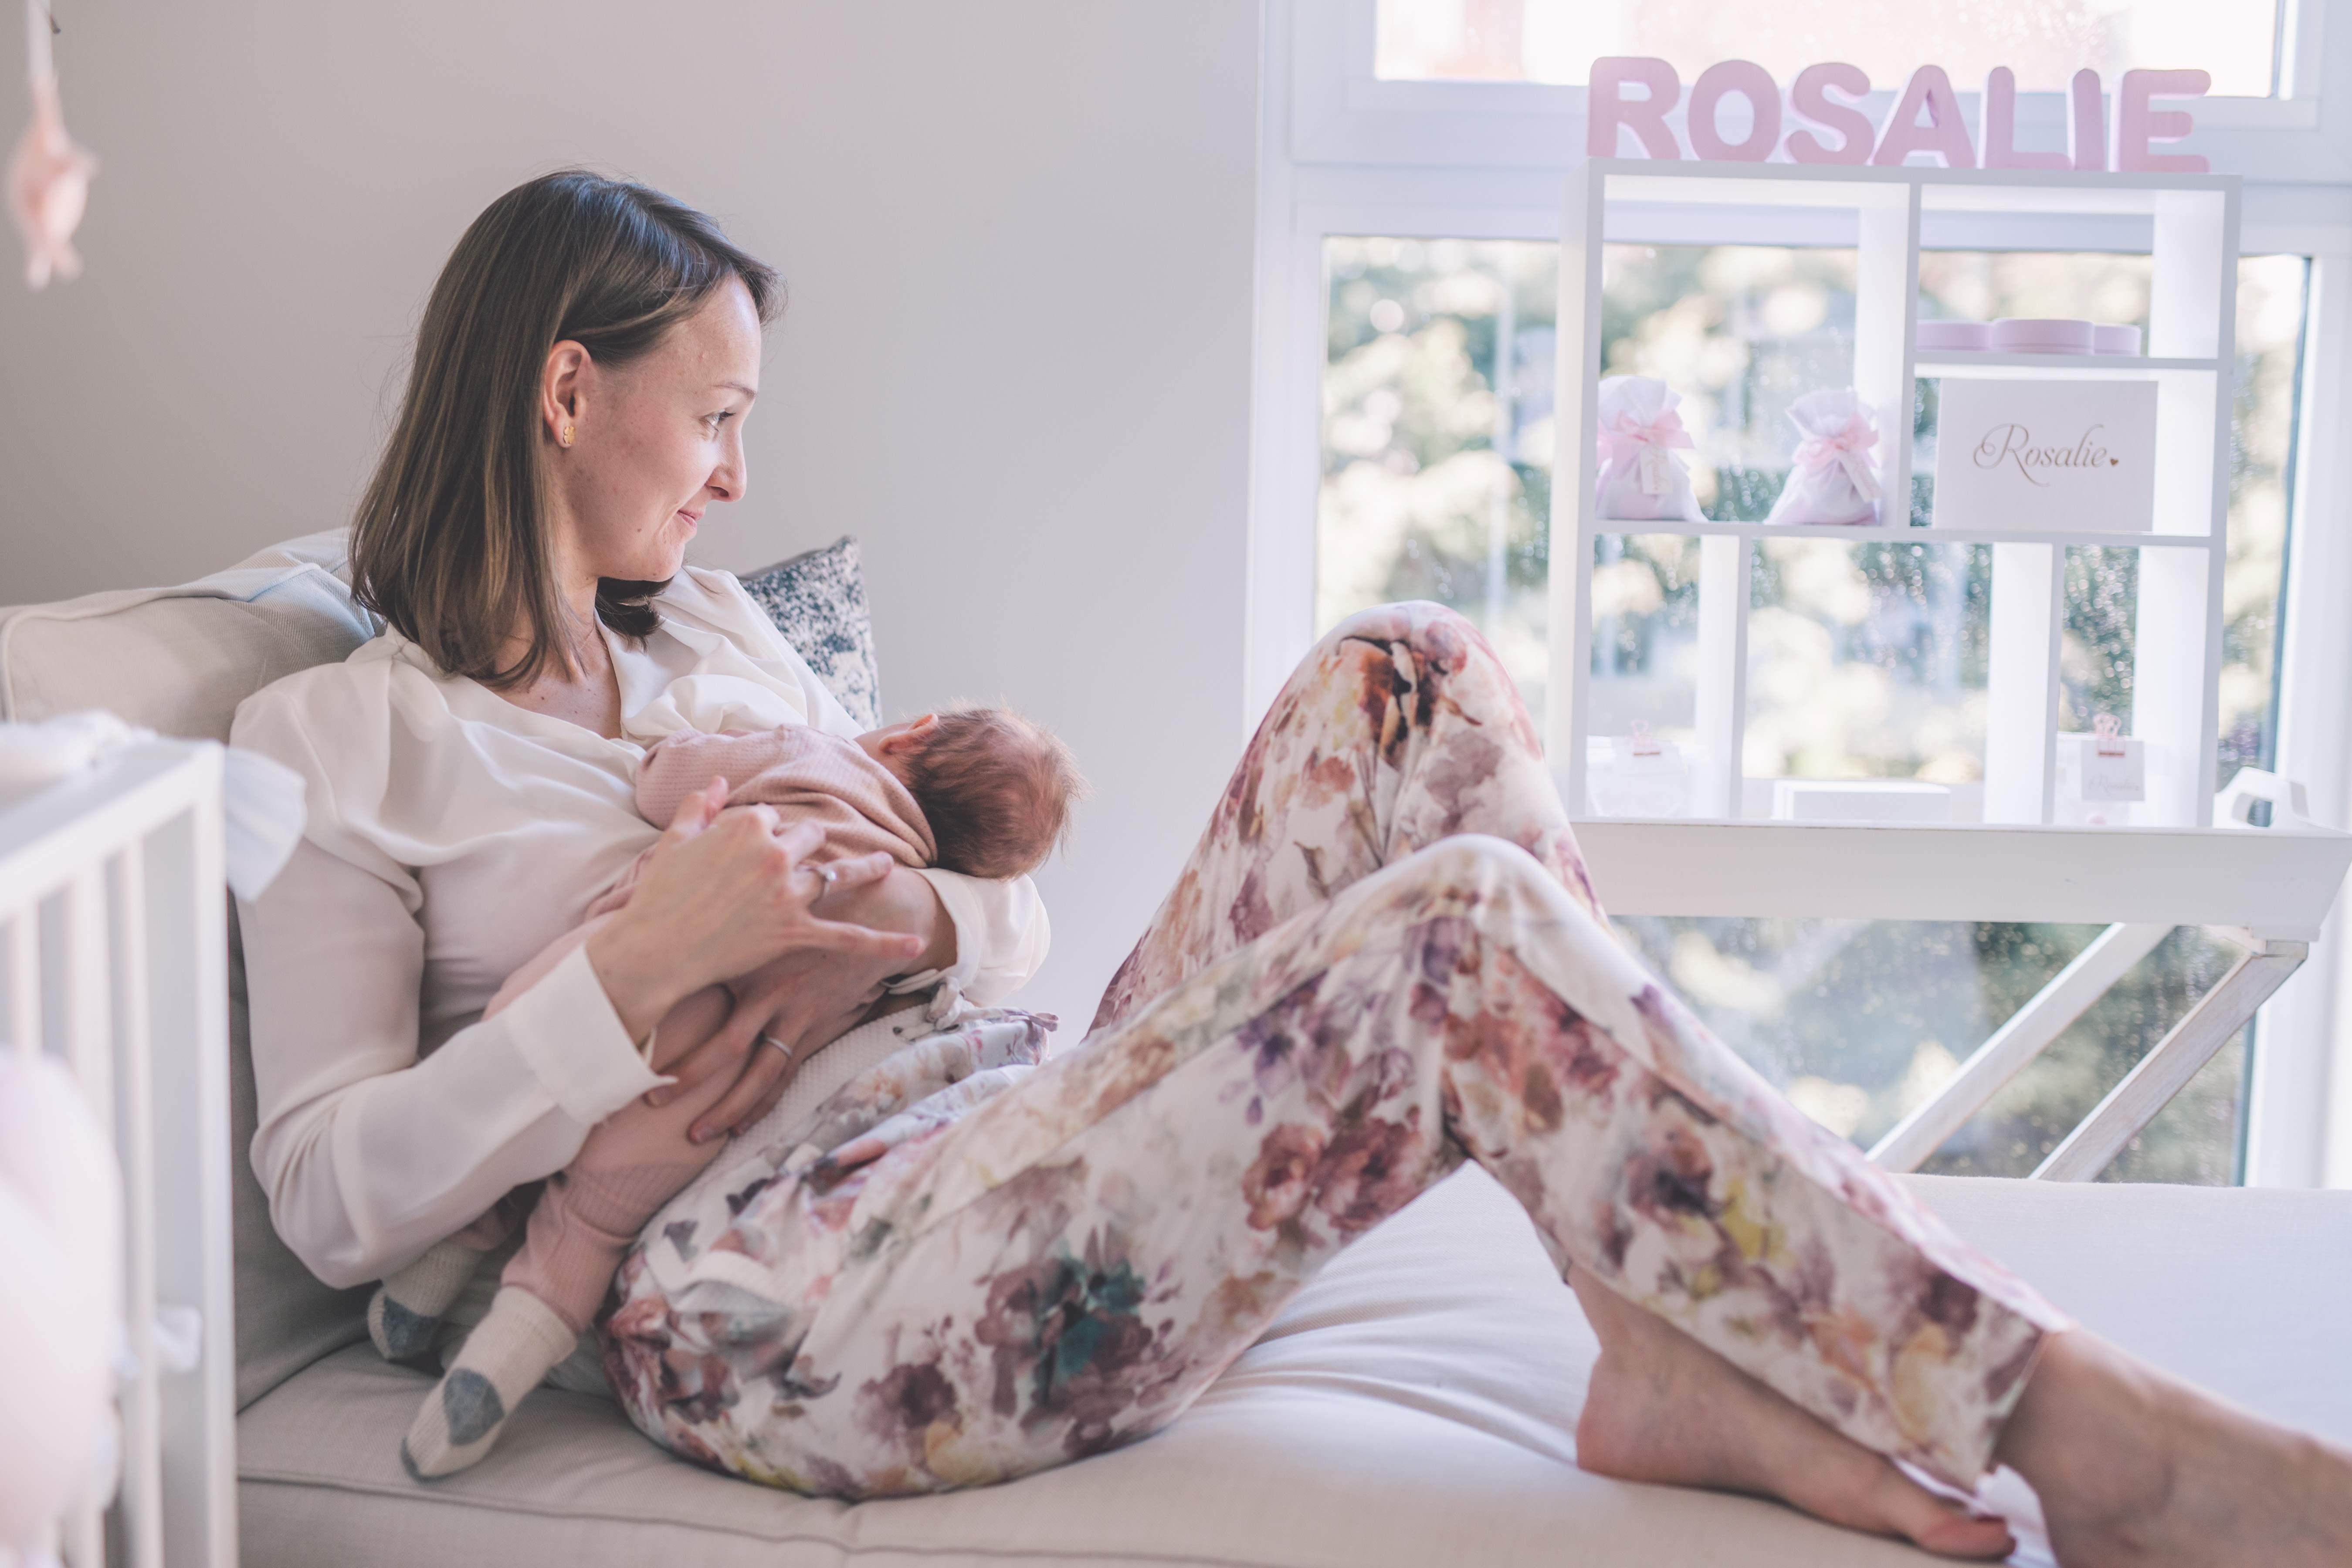 ROSALIE-27